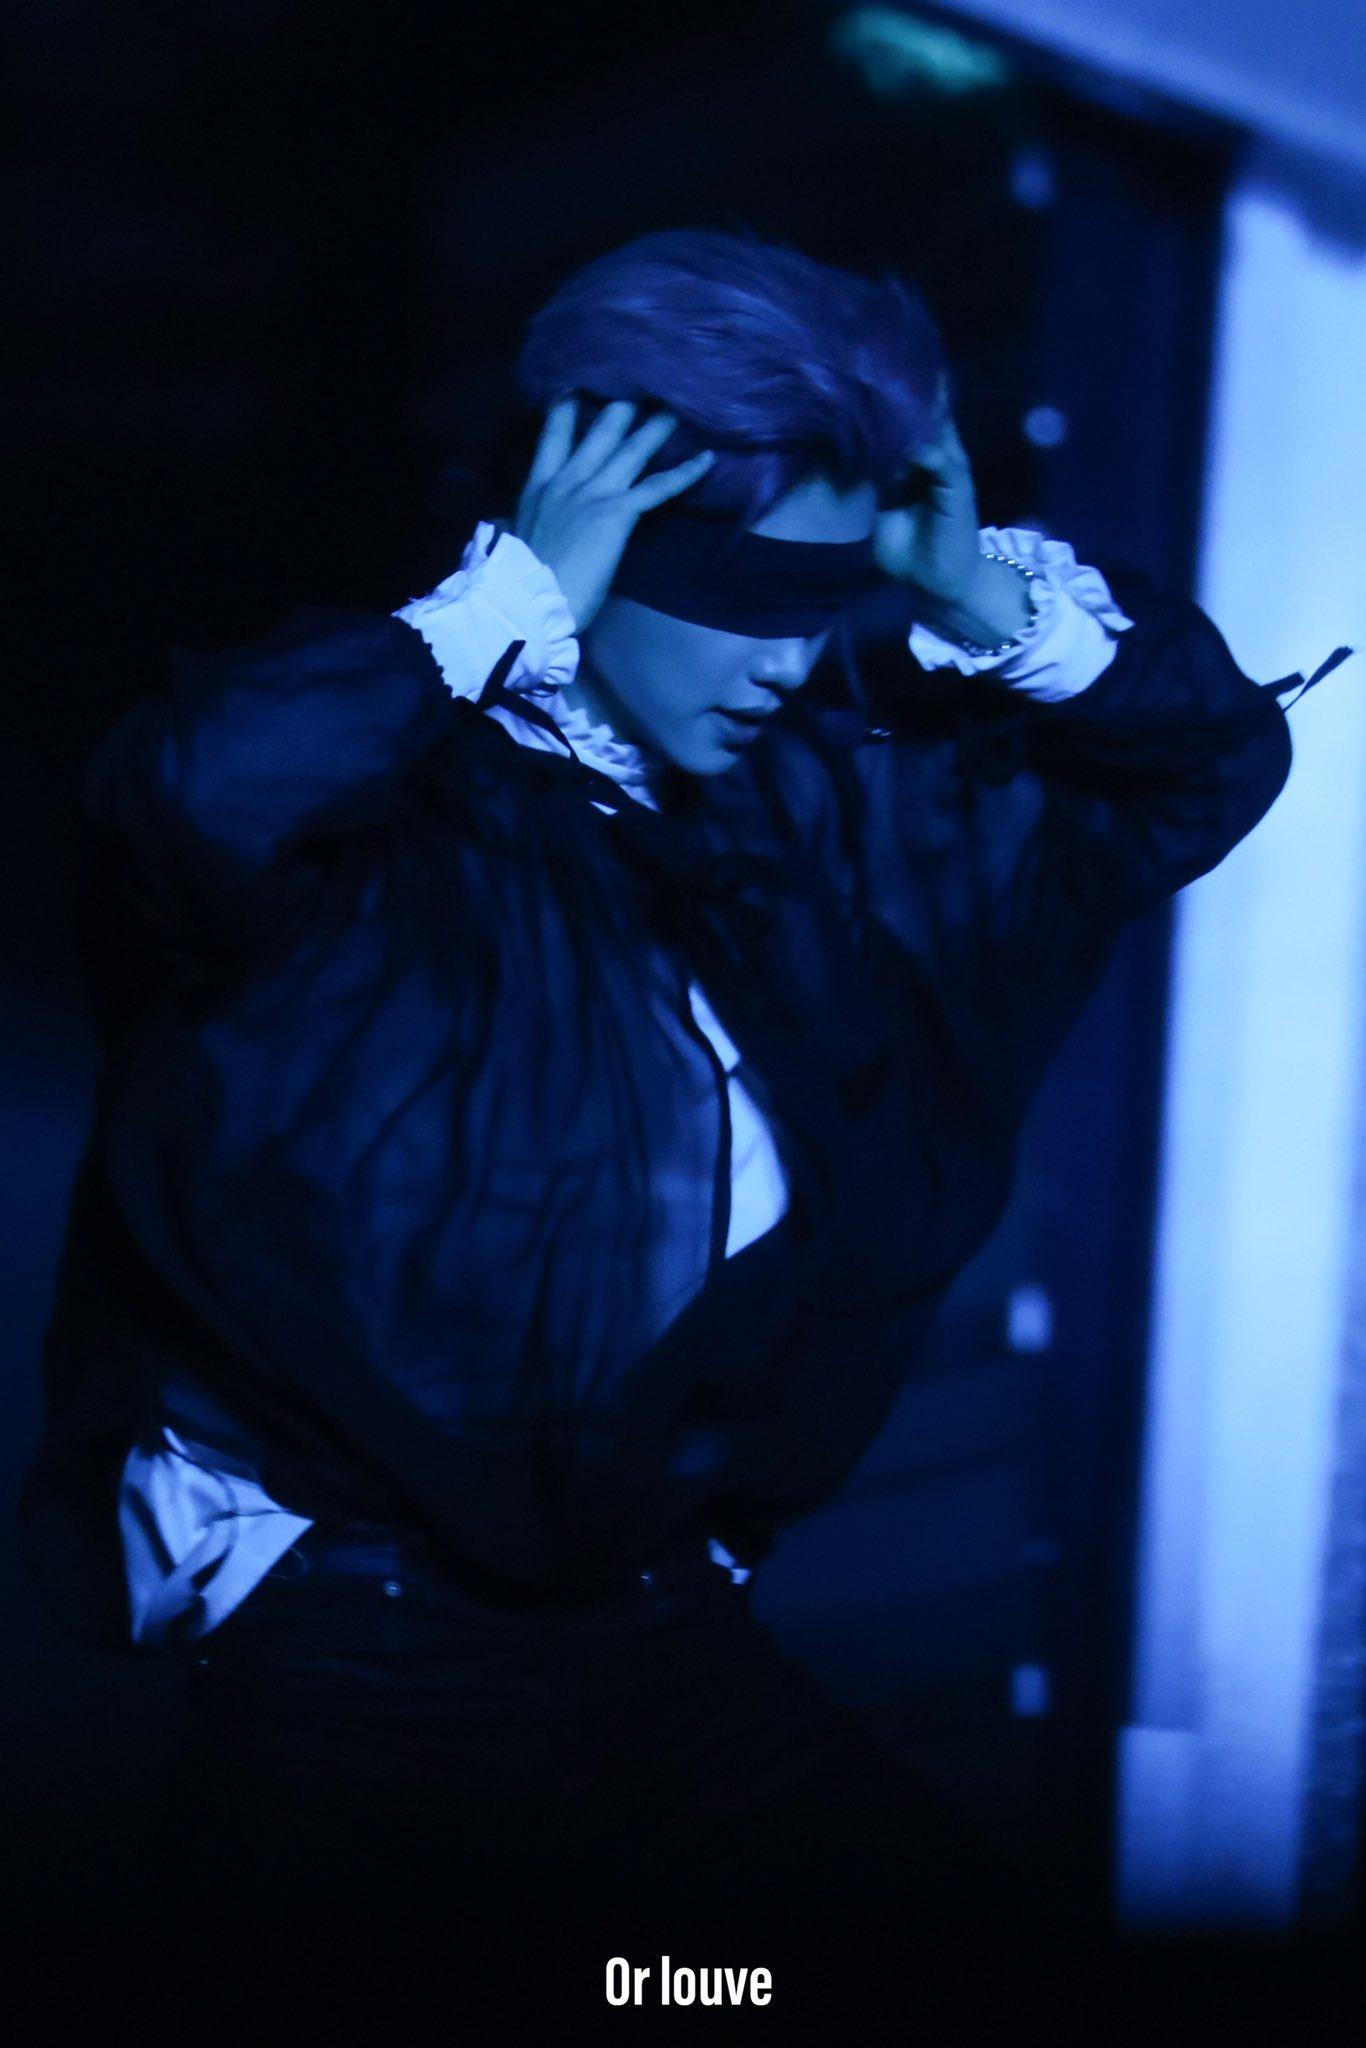 felix blindfold 2